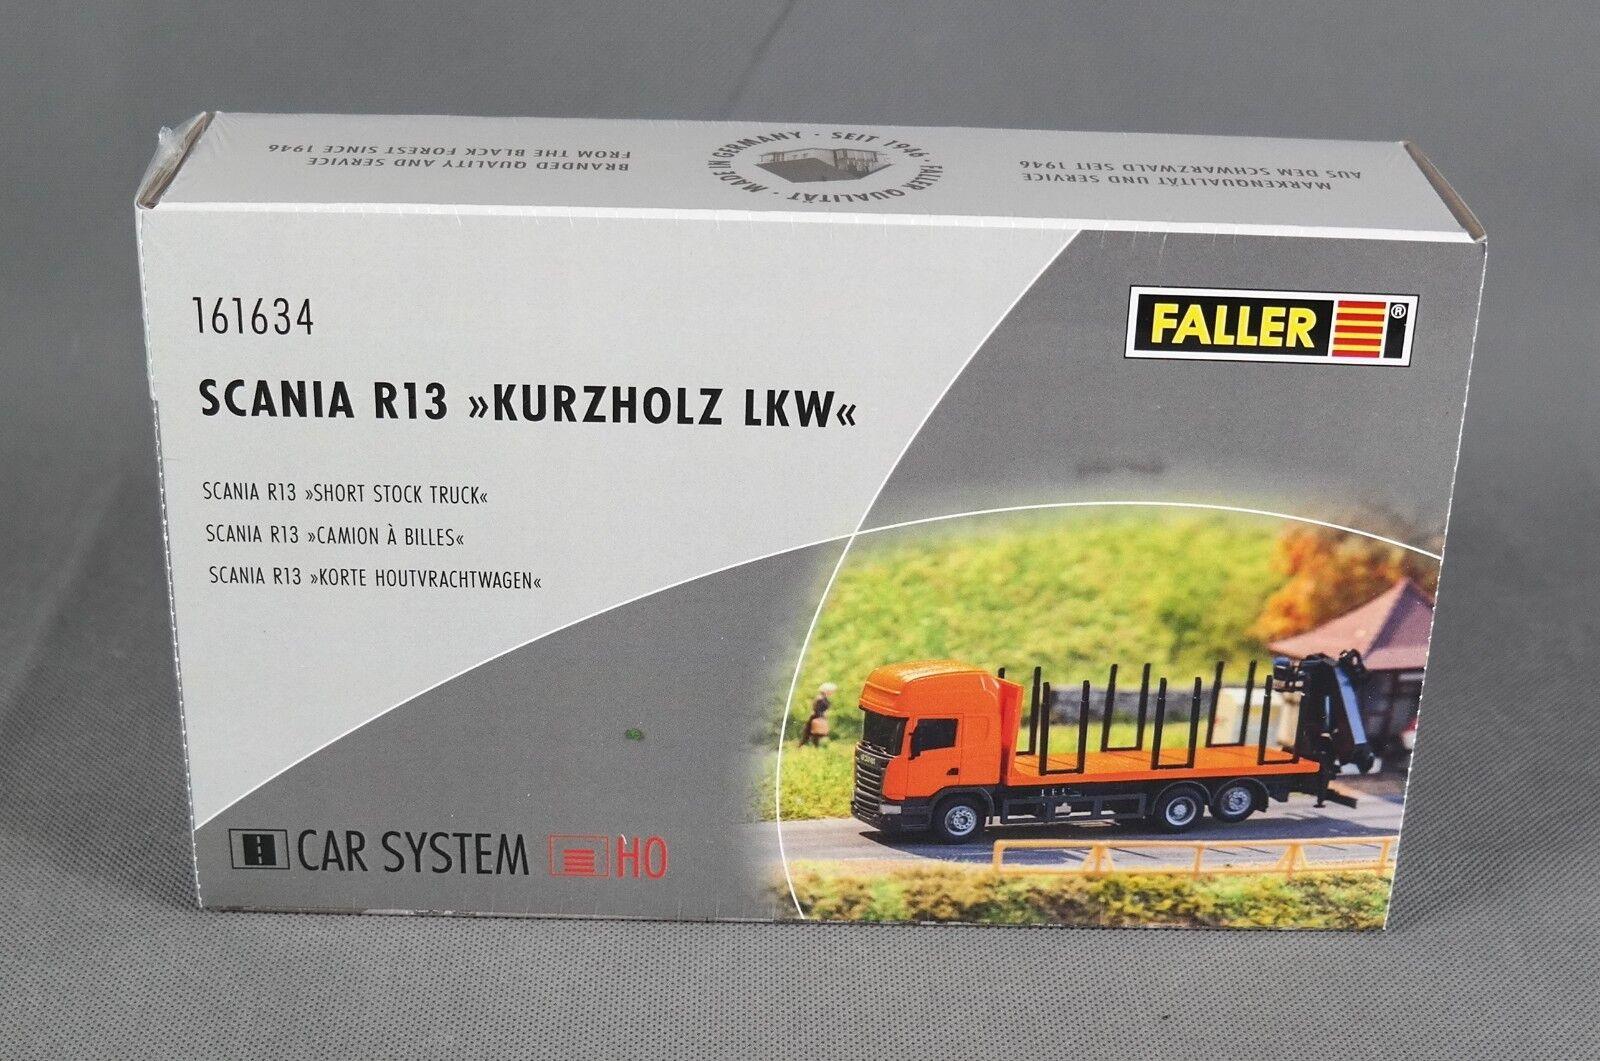 Faller 161634 [h0, carsystem] scania r 13 kurzholz lkw (angeben) - für